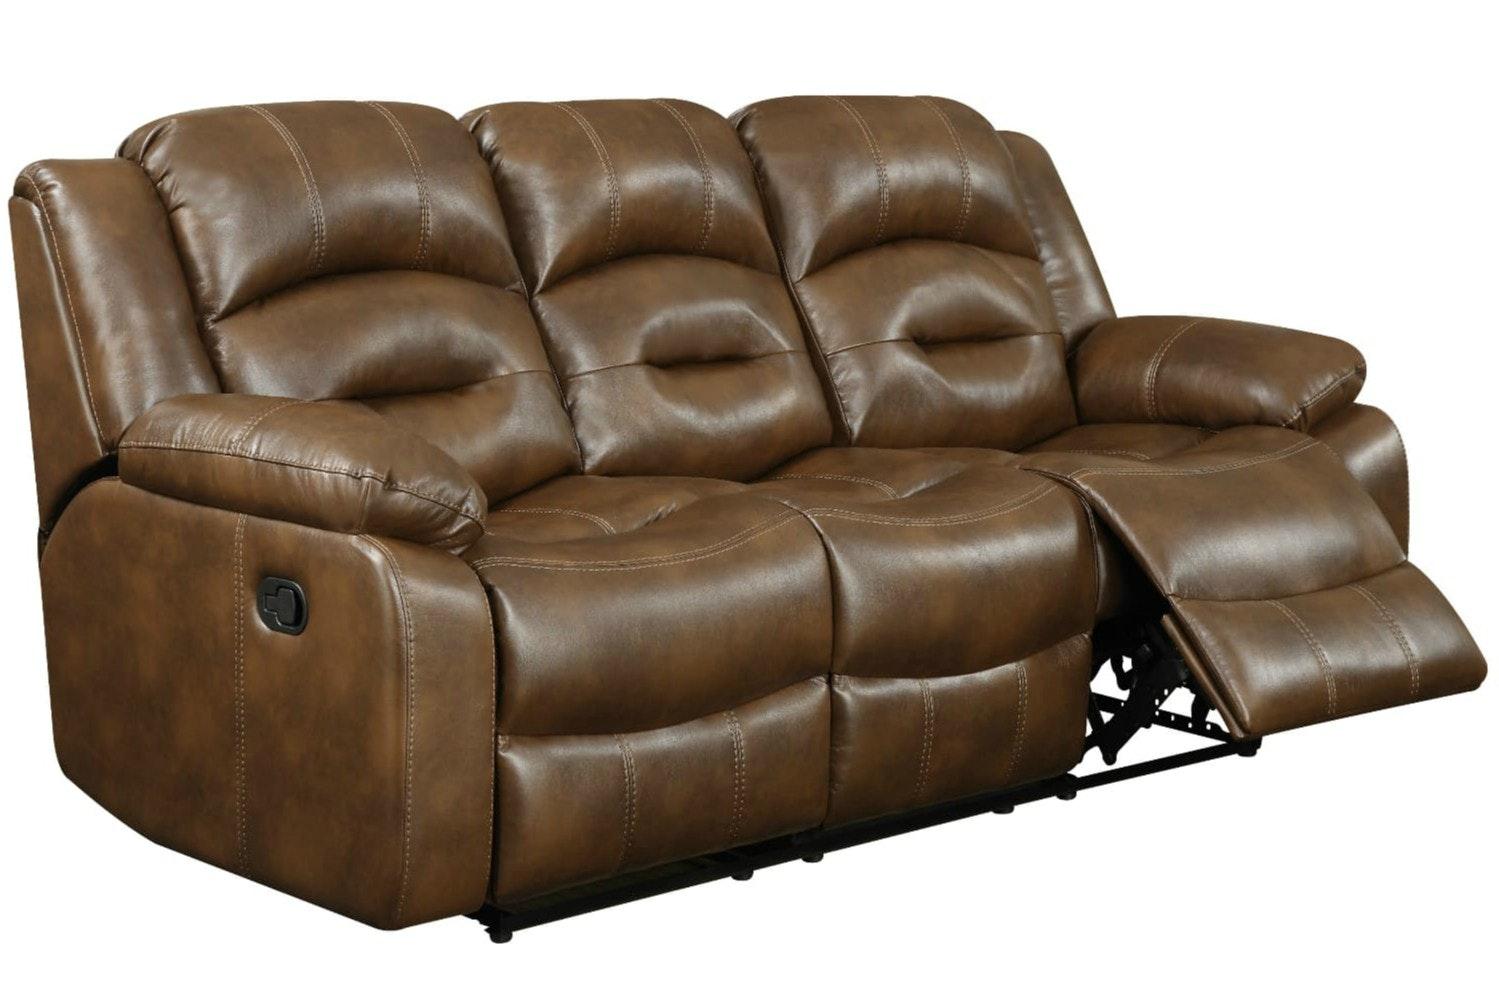 3 seater recliner sofa harvey norman sofas ireland